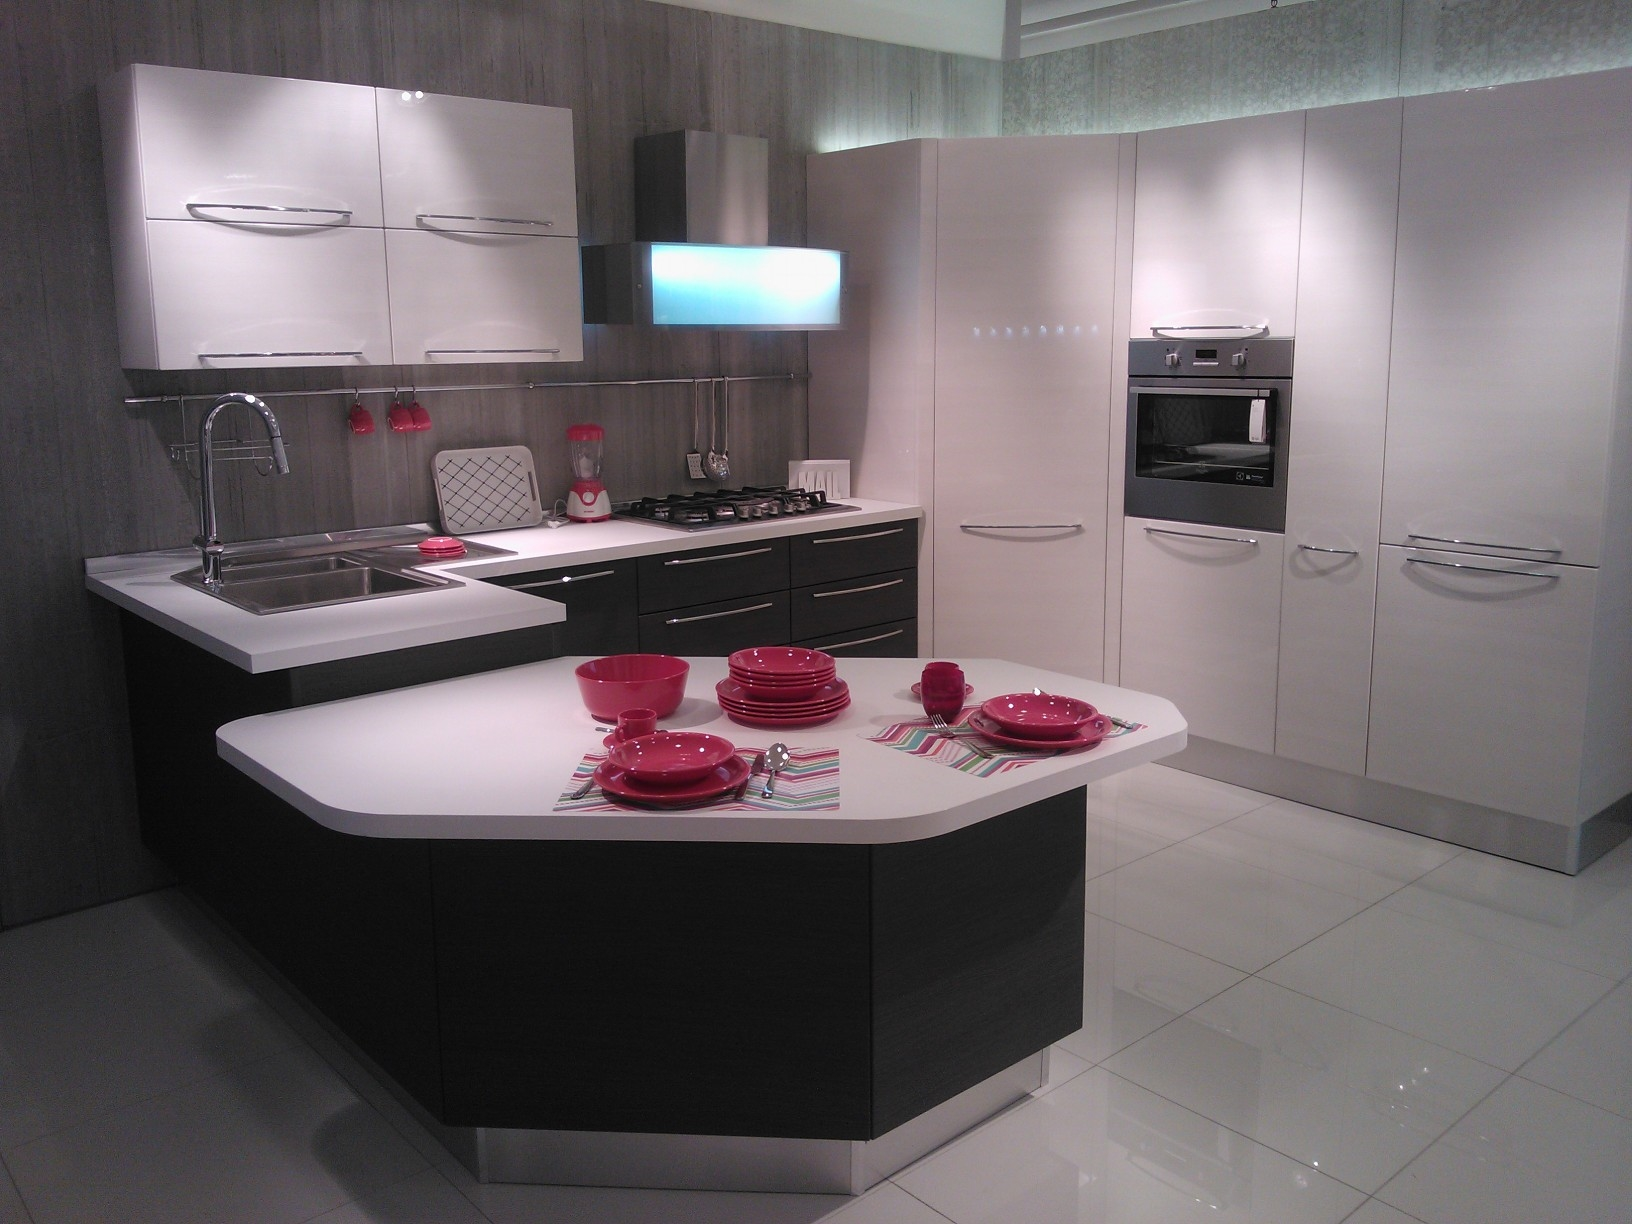 Stunning veneta cucine con isola contemporary home ideas - Costo cucina veneta cucine ...